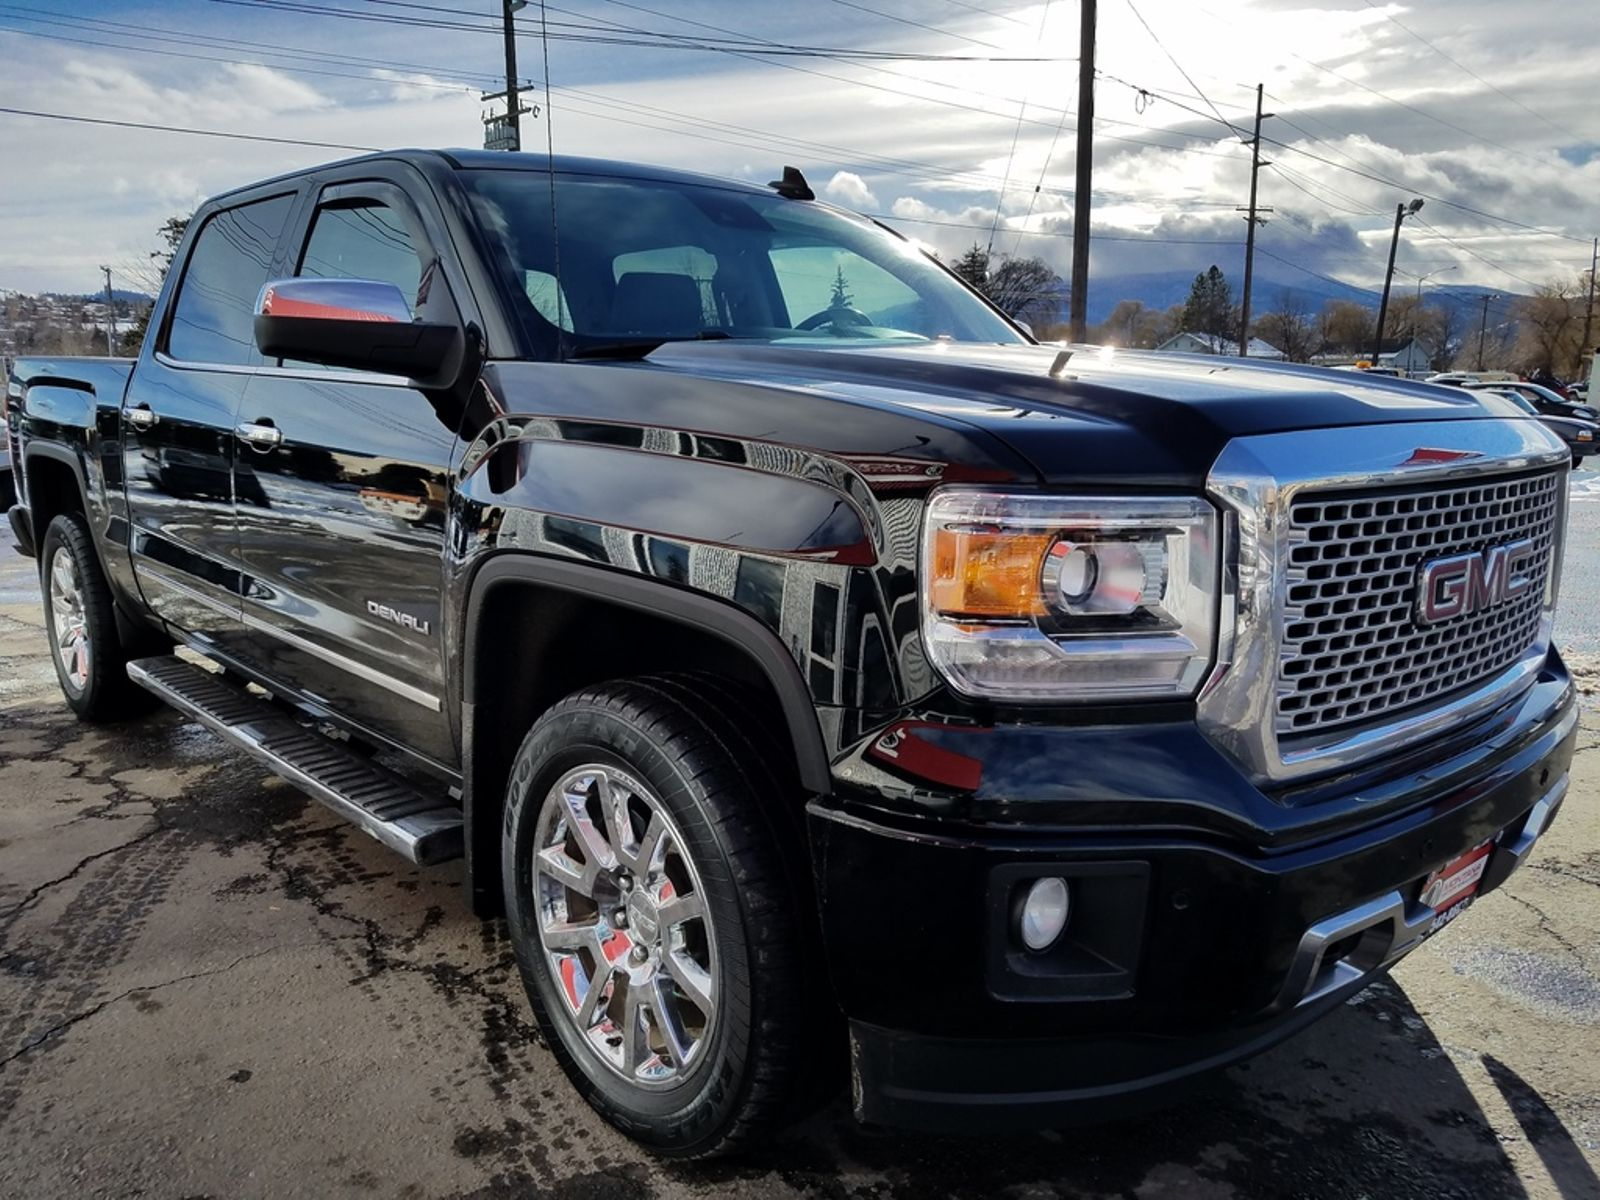 news for new sale road gmc beast n sierra htm wheels off fuel